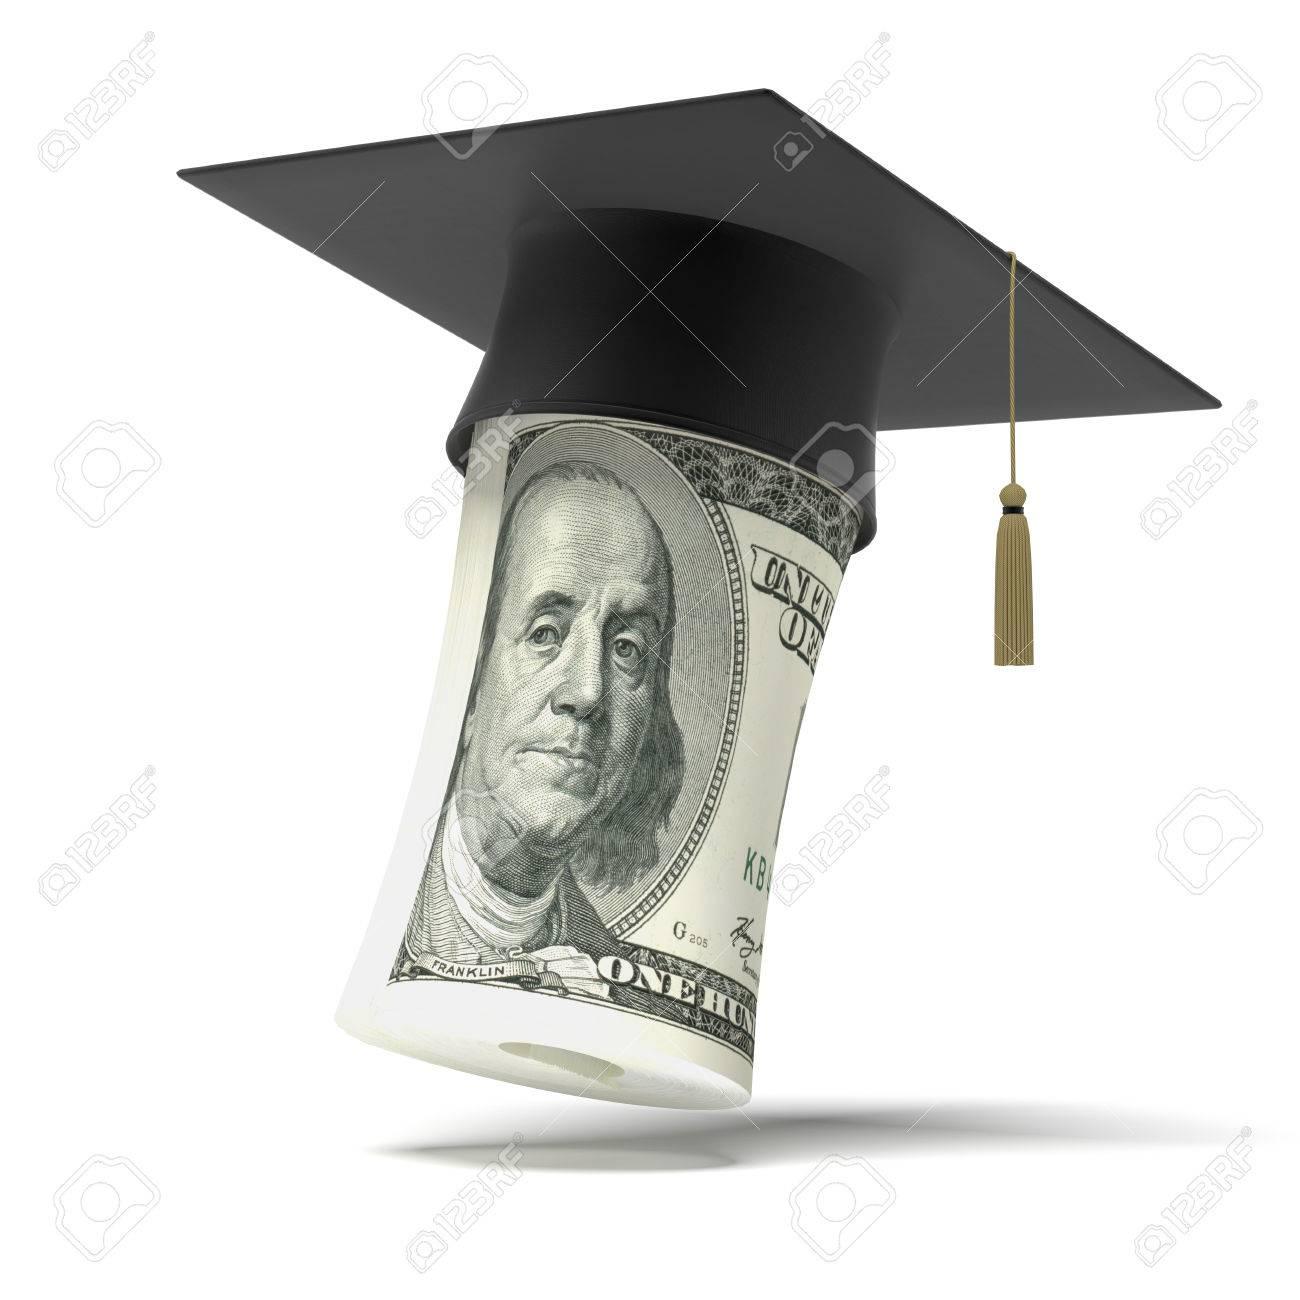 Education dollar isolated on a white background Stock Photo - 22403148